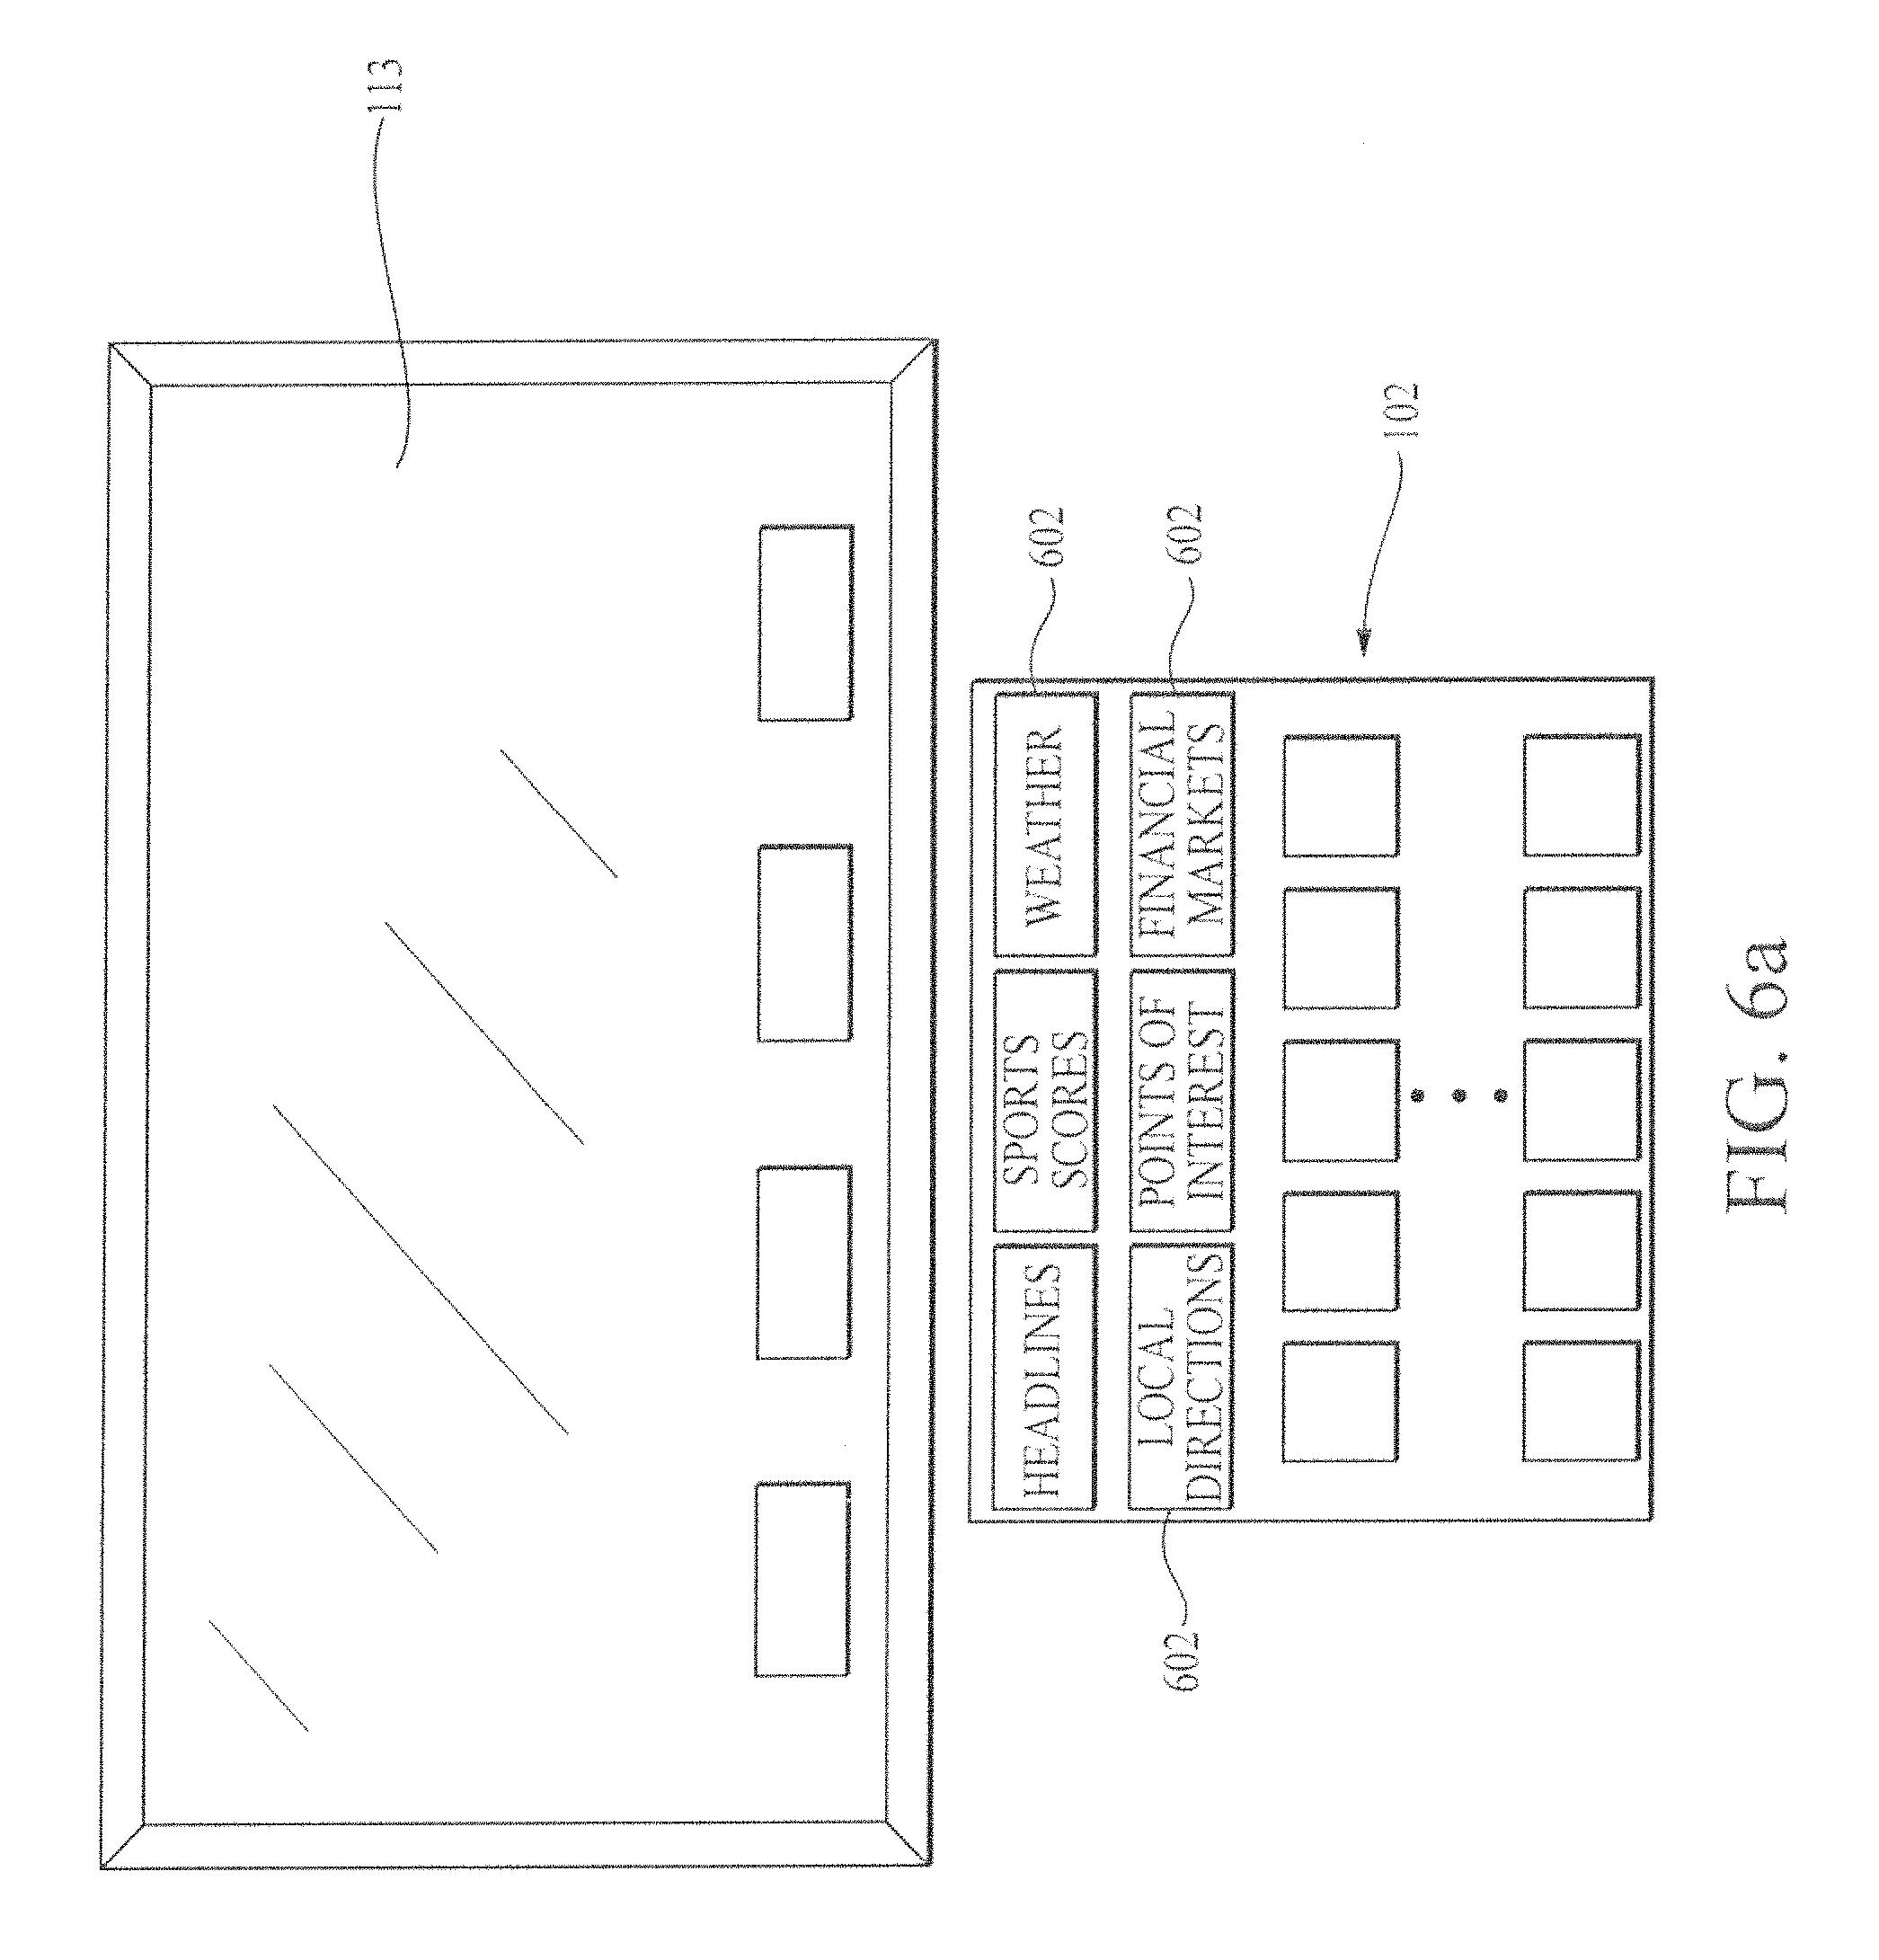 Patent US 9,715,368 B2